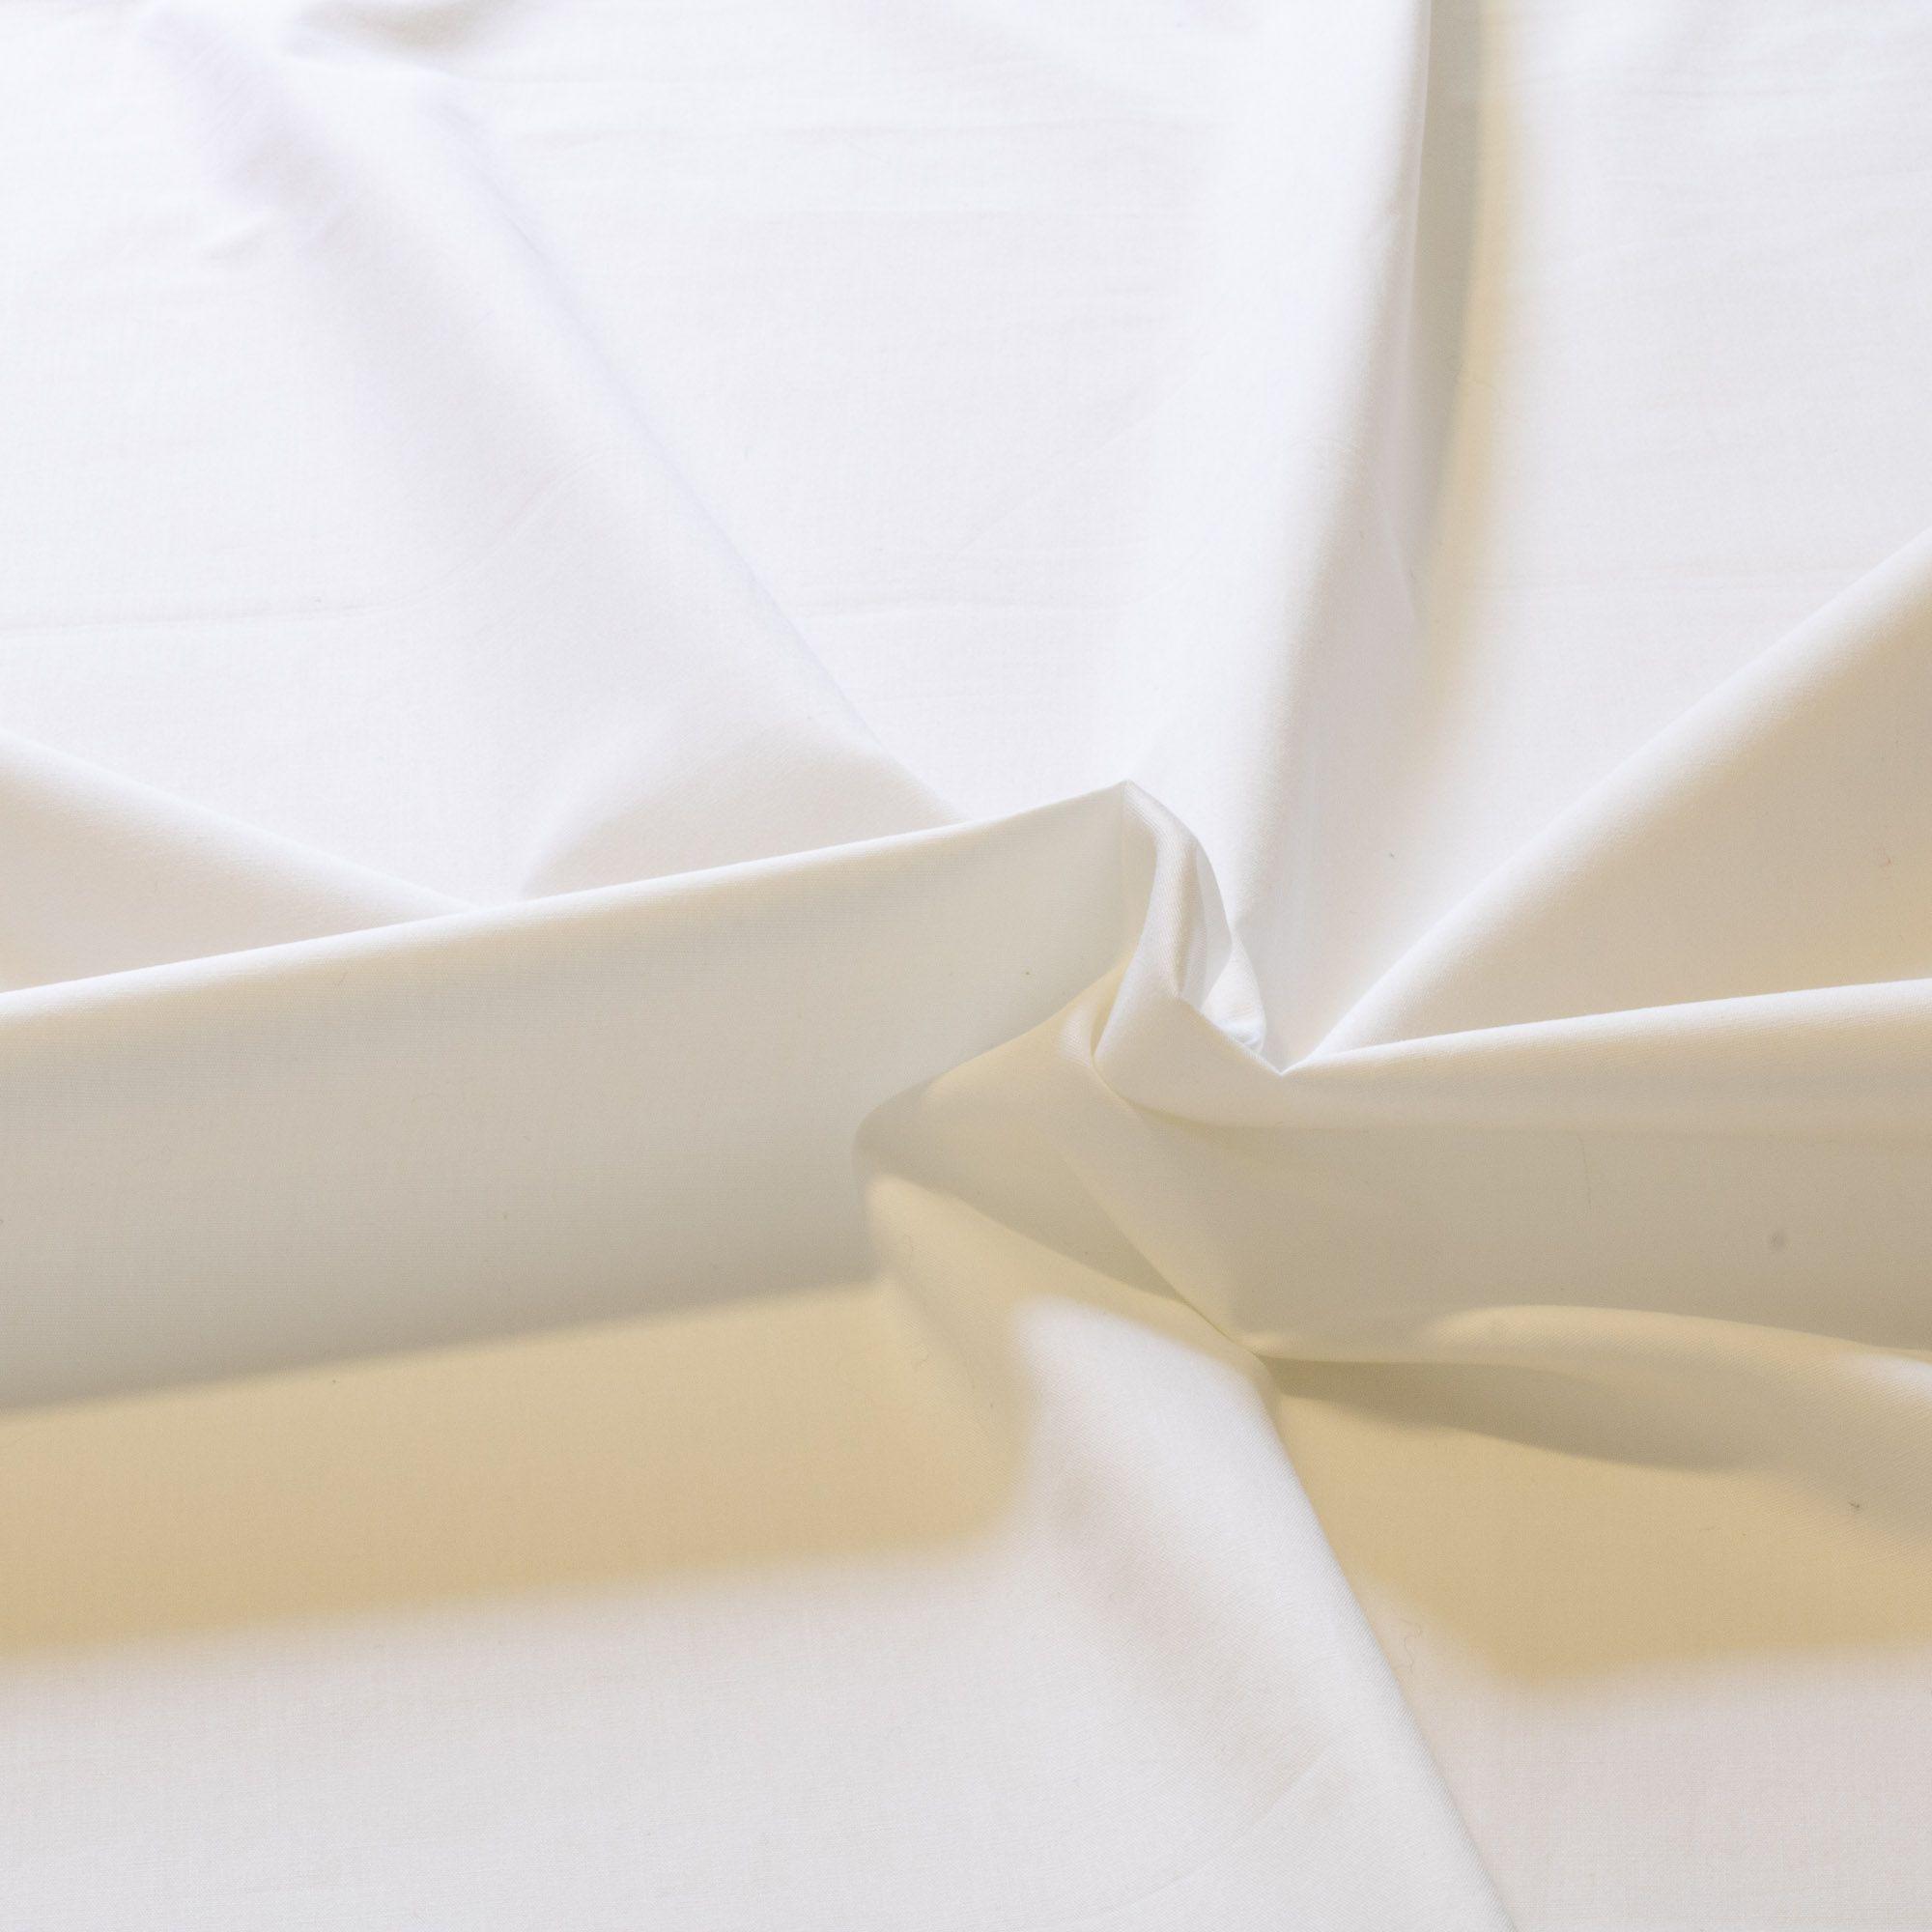 Tecido Tricoline Branco 100% Algodao 1,50 m Largura